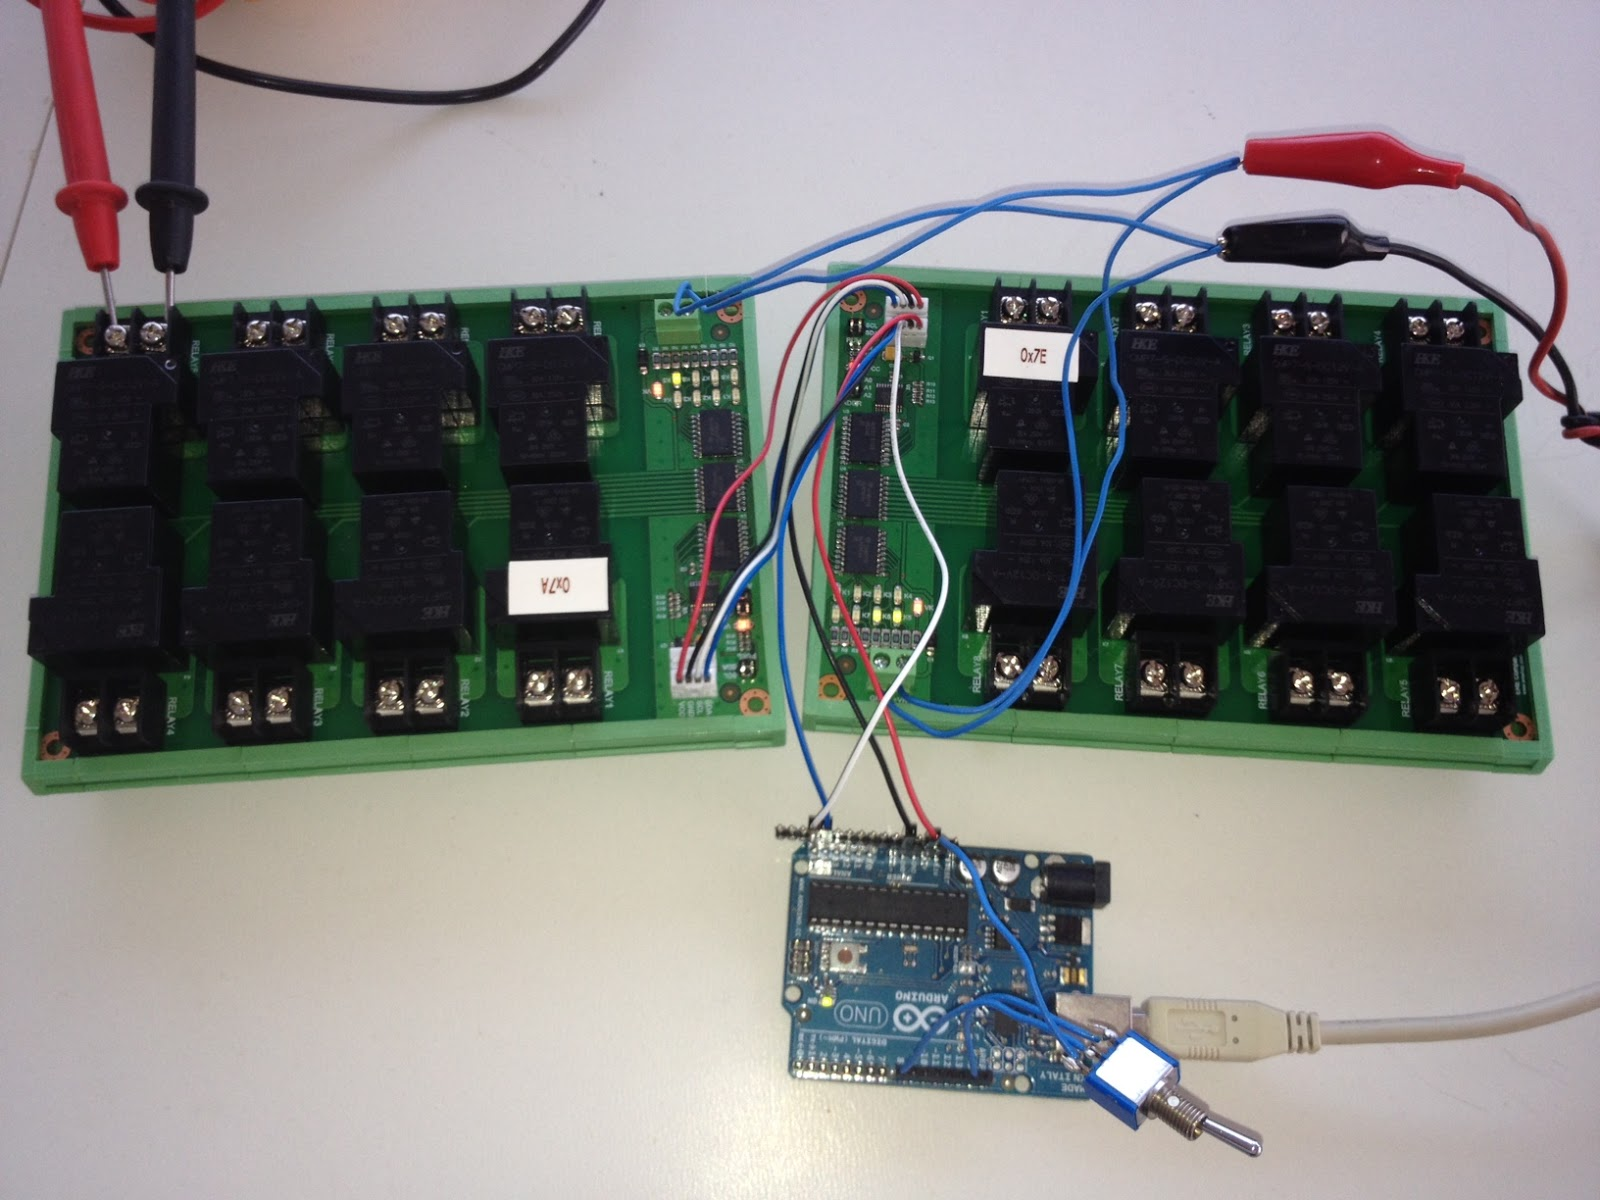 I2c Rl812l Ere Bus Heavy Current Relay 12v Pcf8574 Arduino Input Board2init Pinmode8 Void Loop Byte Switch Digitalread8 Board1setrelay4 Board2togglerelay4 Delay100